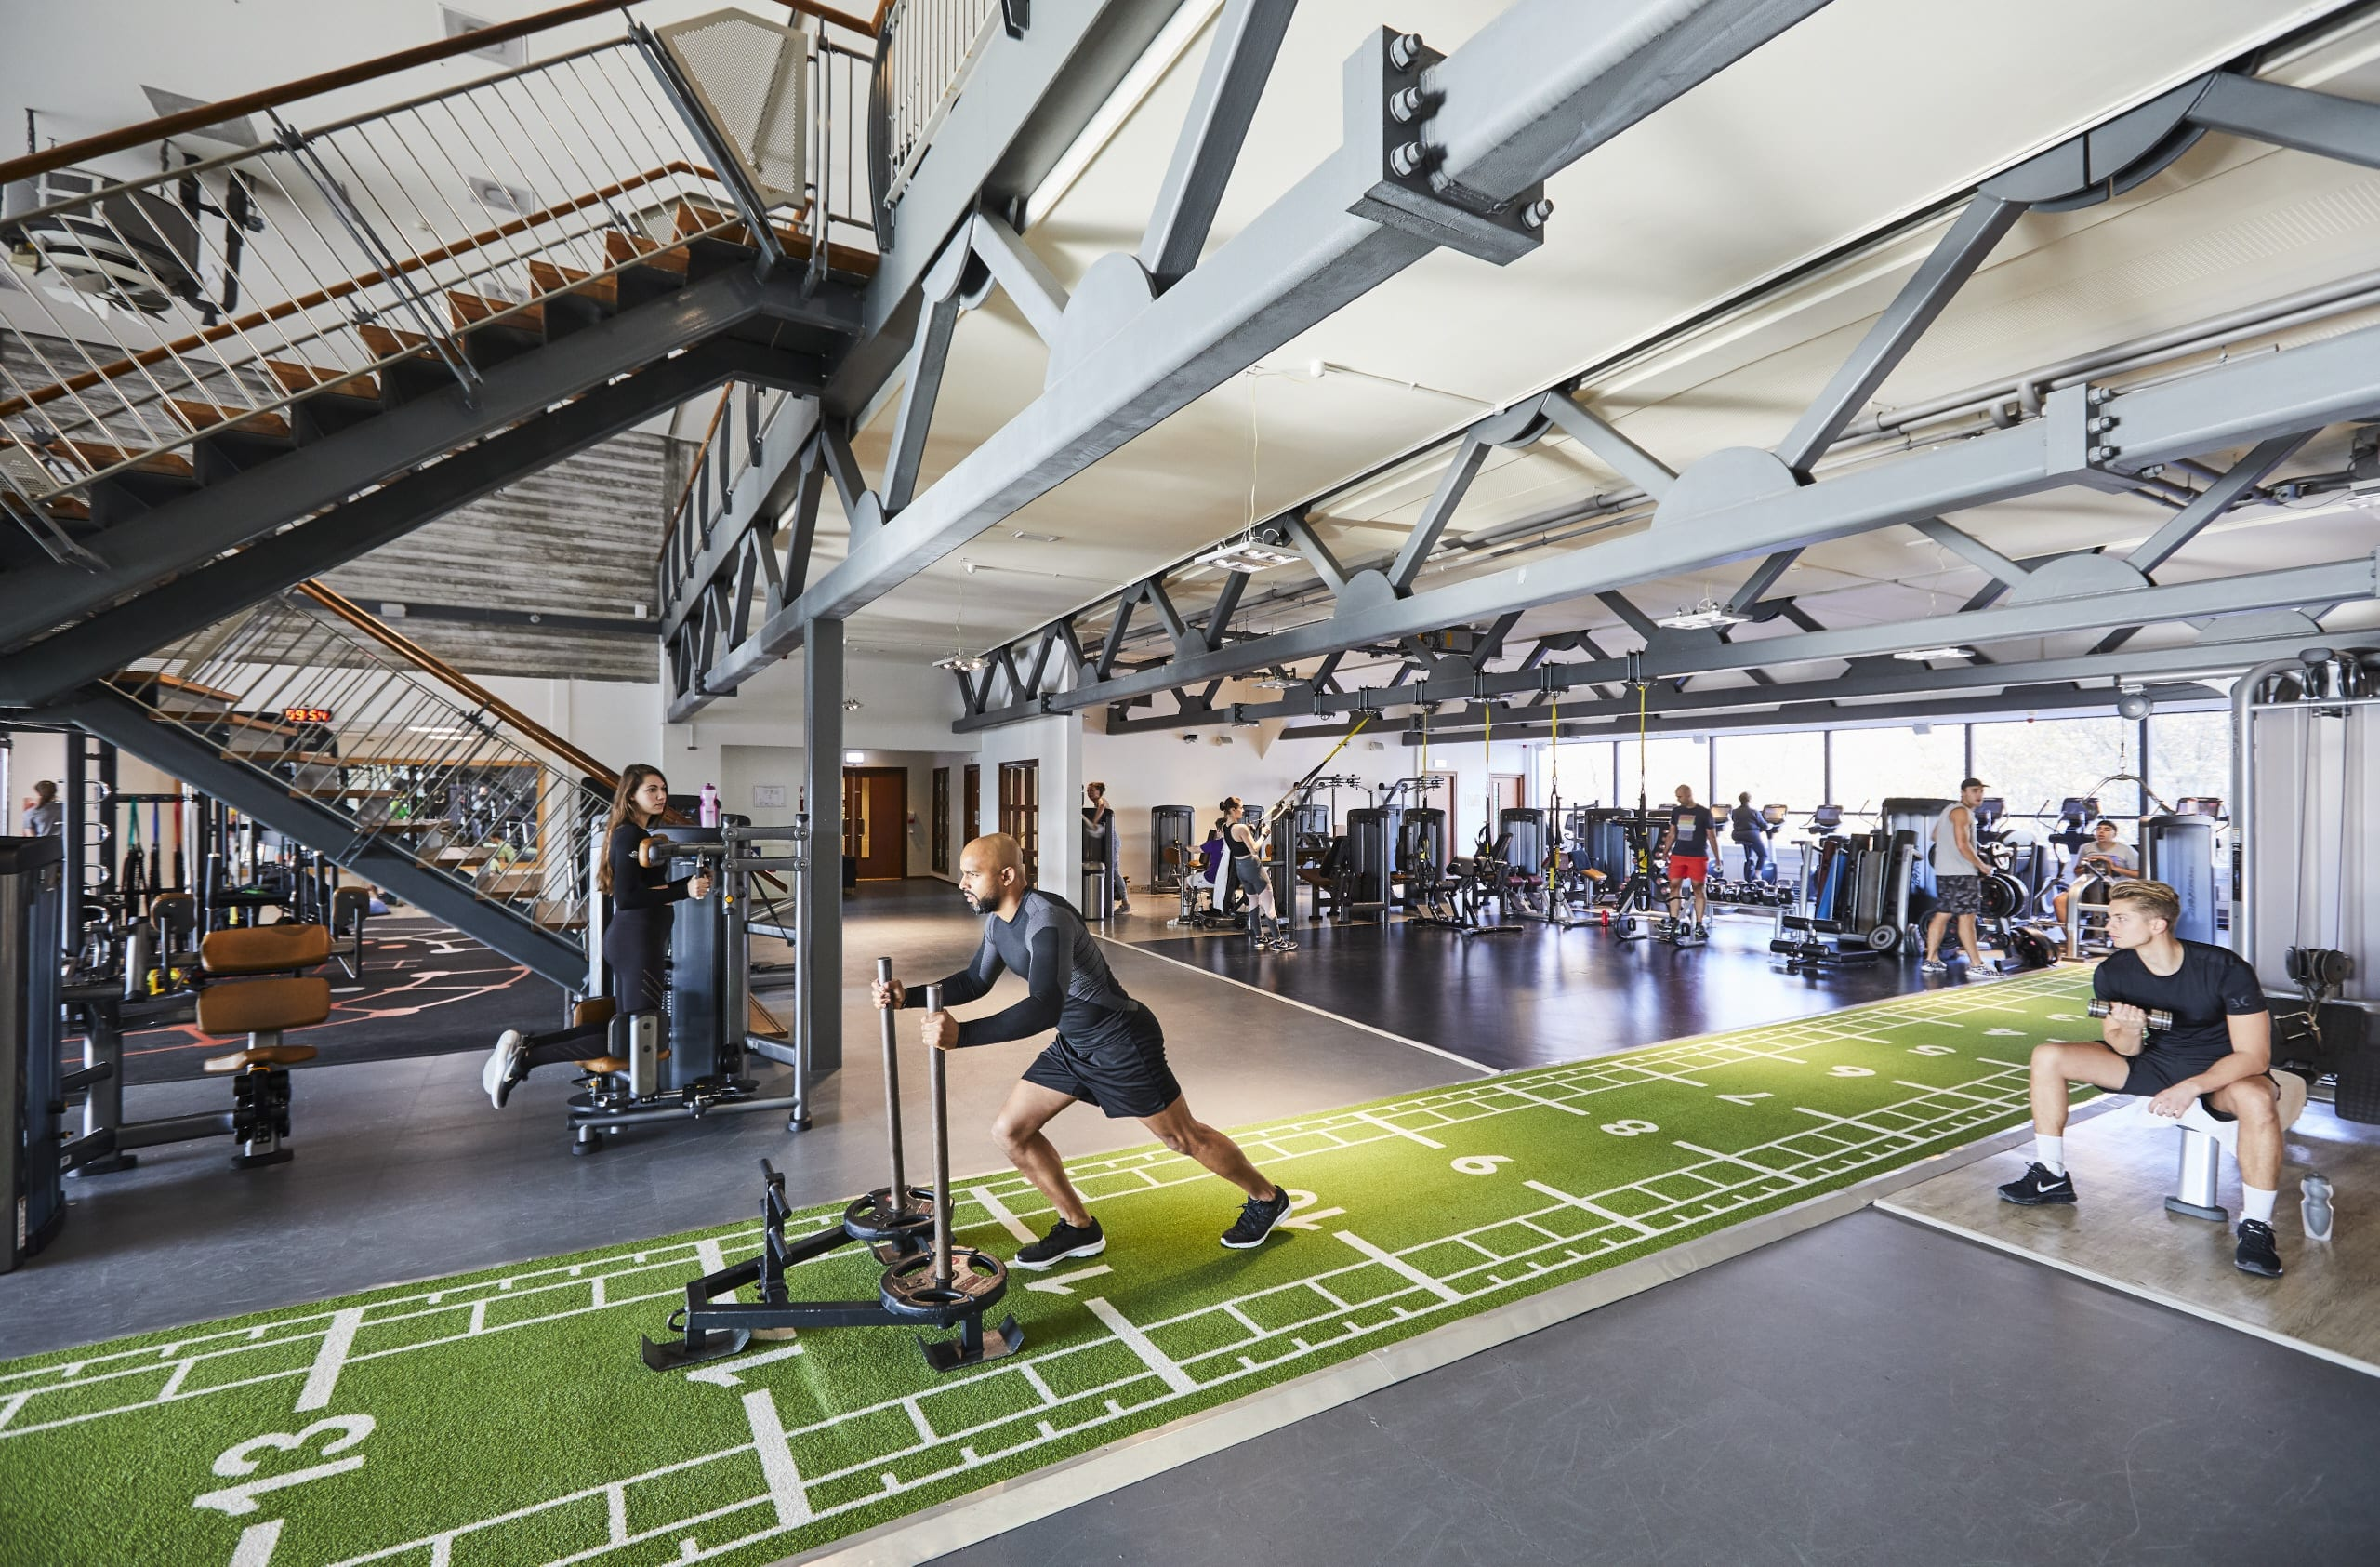 Image of the gym at David Lloyd Rotterdam Centrum